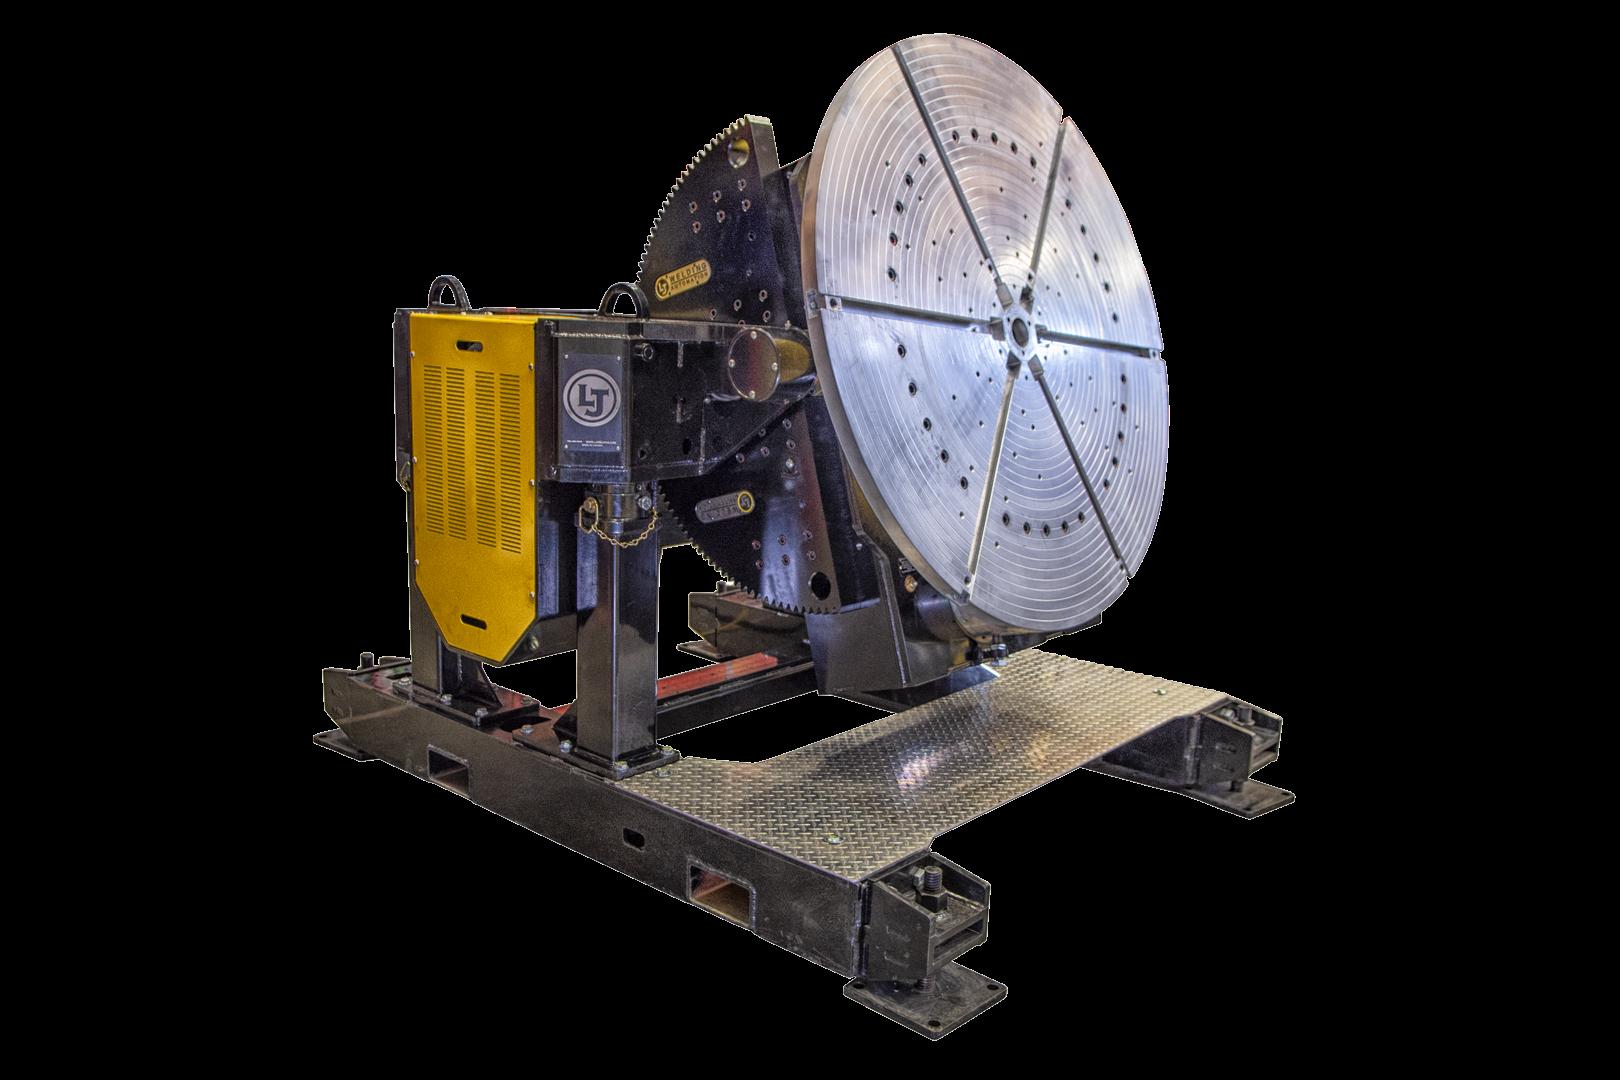 gear tilt welding positioner with 24,000 lbs load capacity